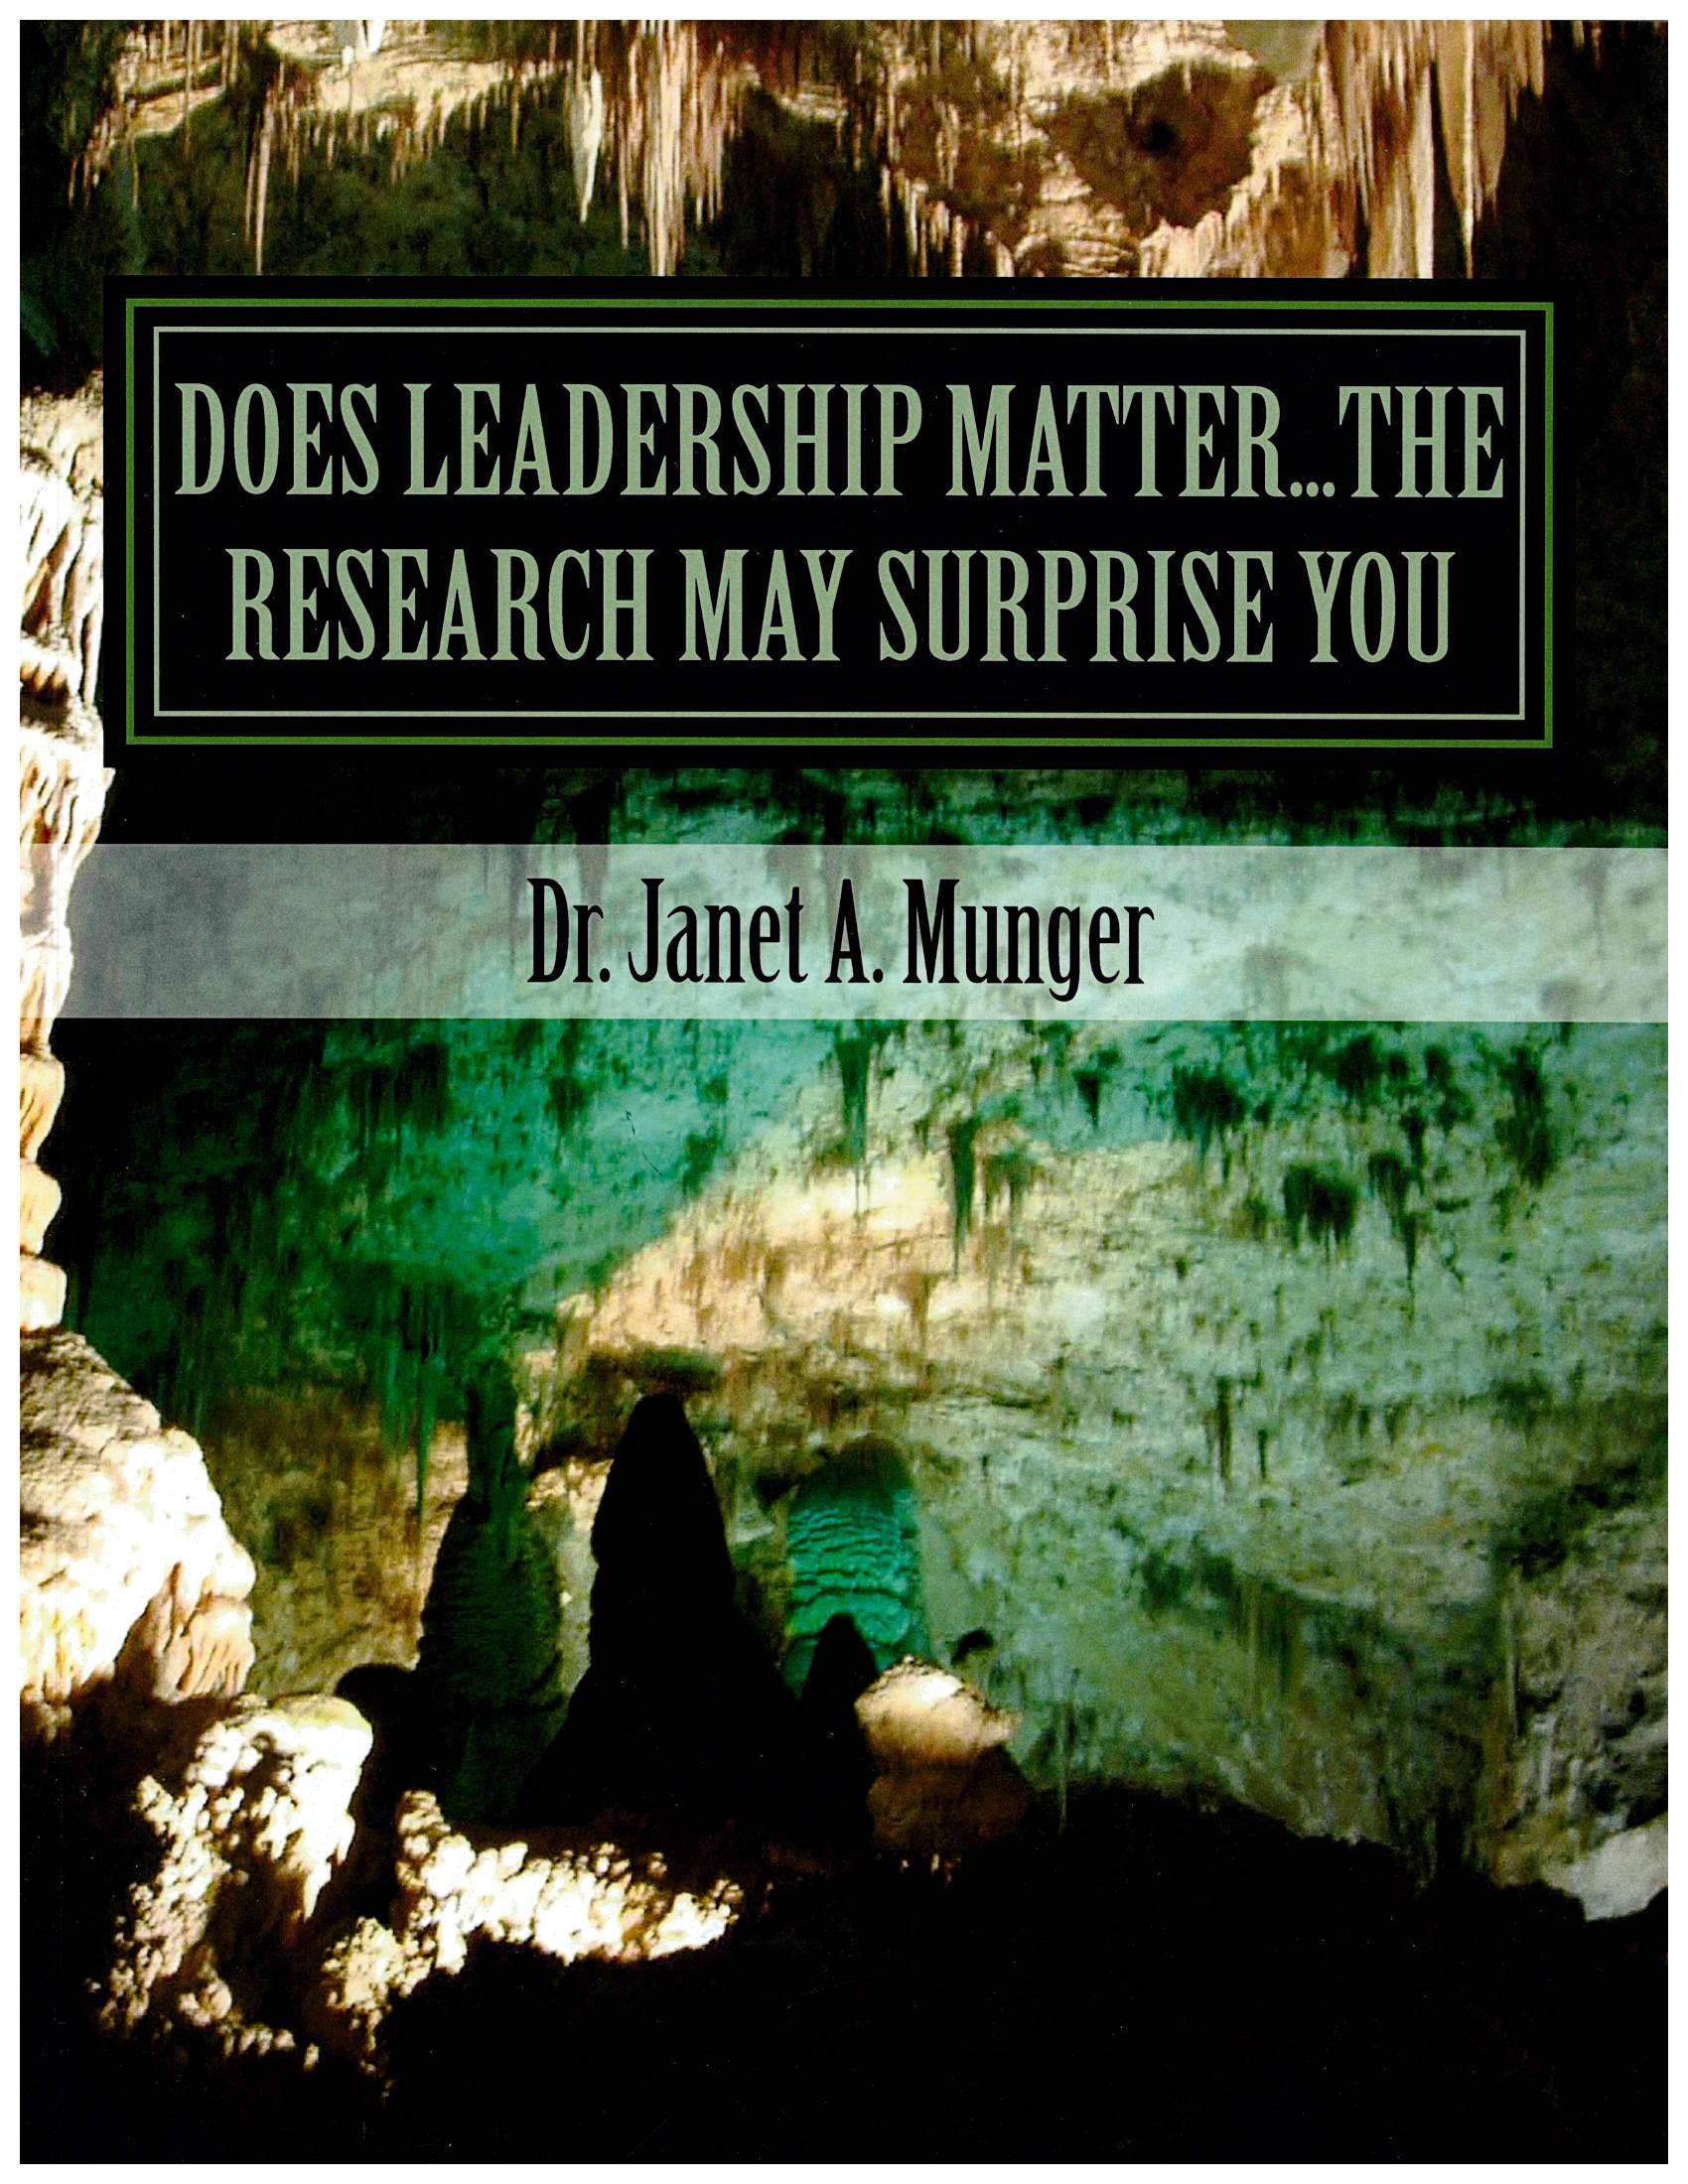 08823f37b529aca3913a_Facebook_JPG_Does_Leadership_Matter_Cover_01-17-17.jpg